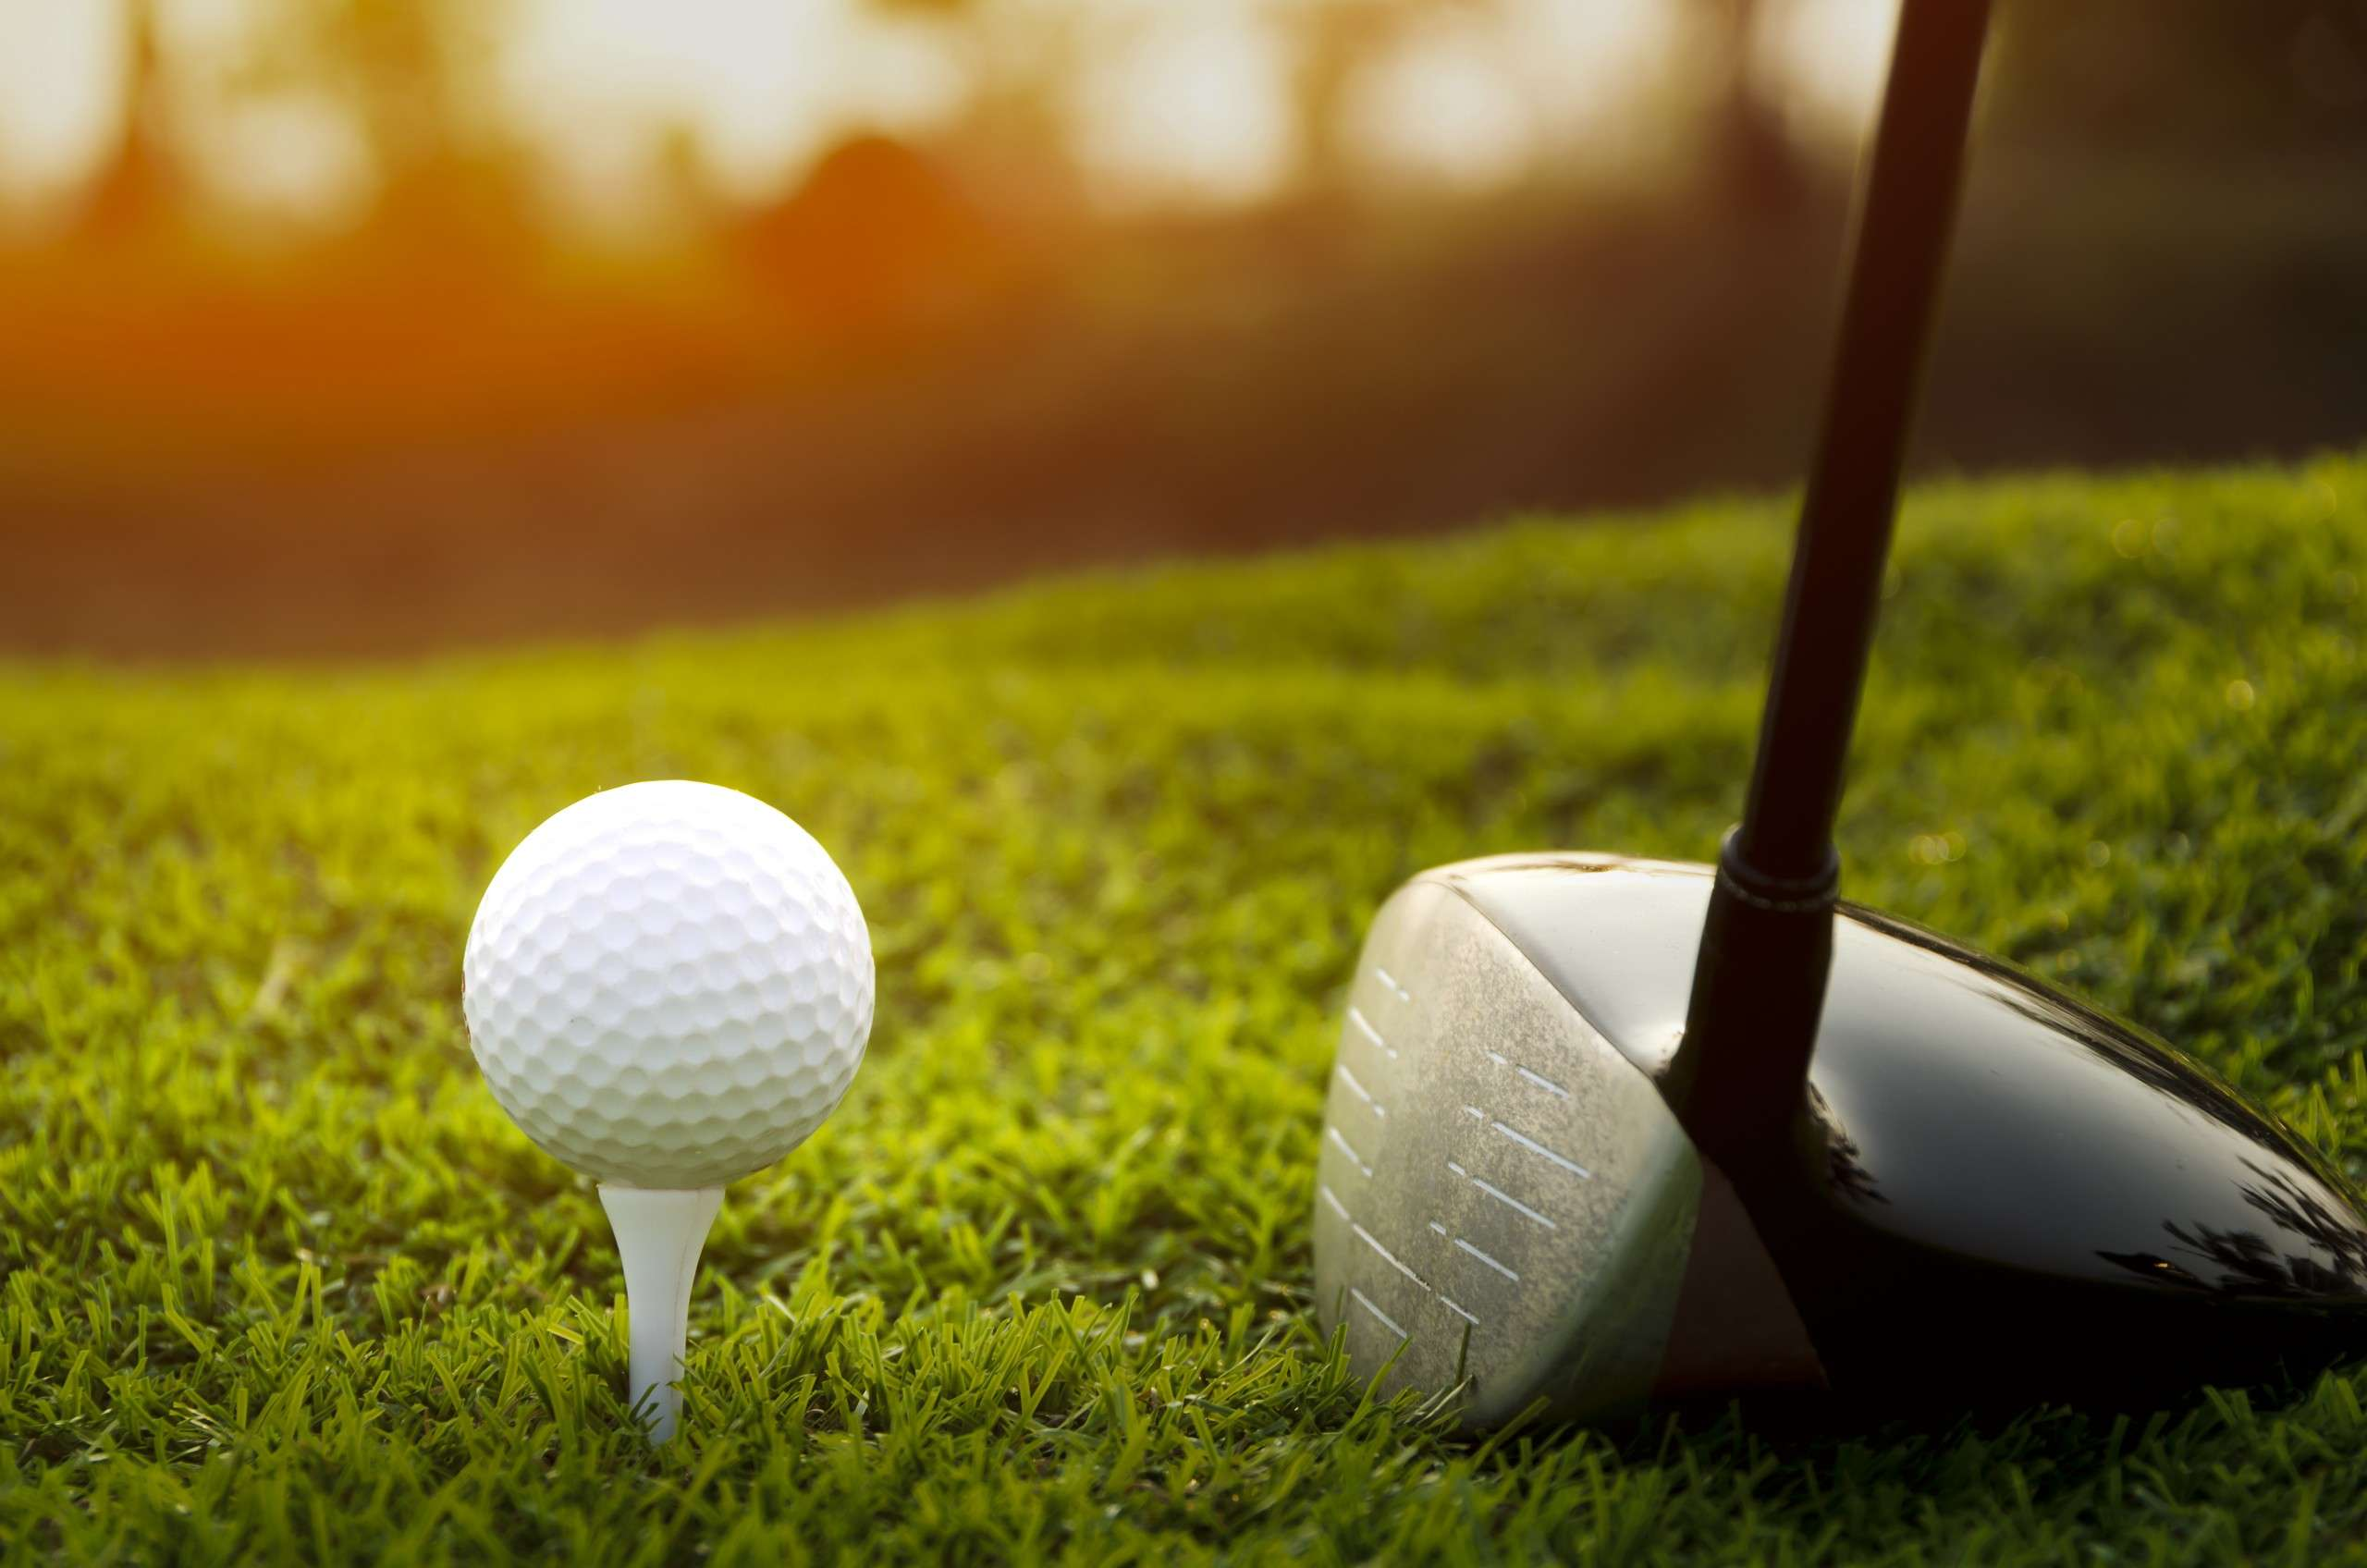 Jamaica's Golfers Eye Regional Championships